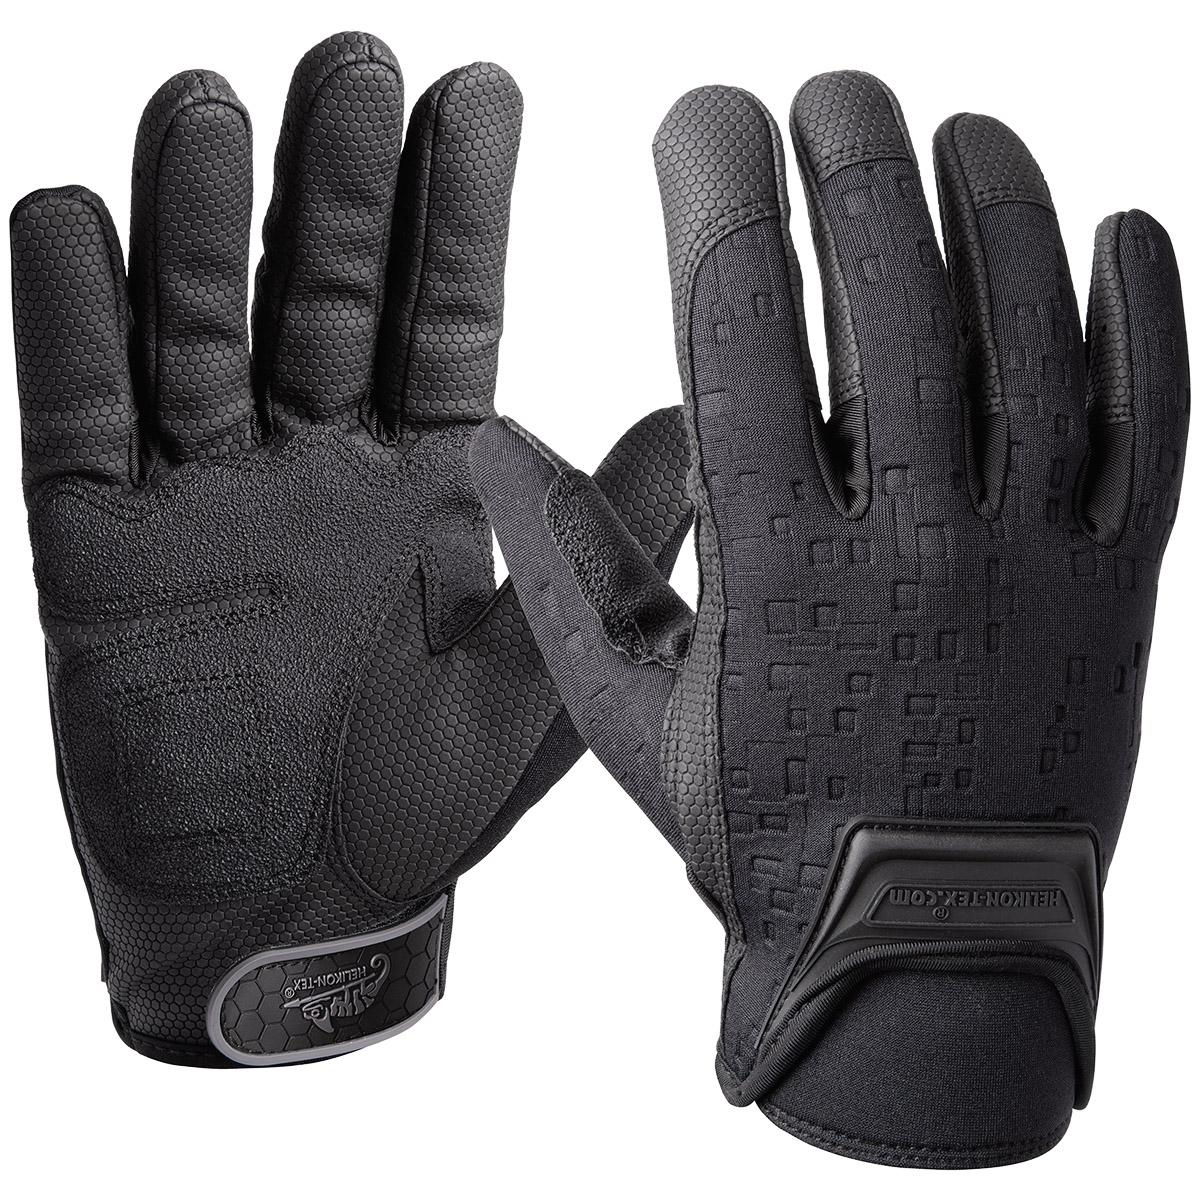 Black tactical gloves - Helikon Utl Urban Tactical Line Gloves Combat Protection